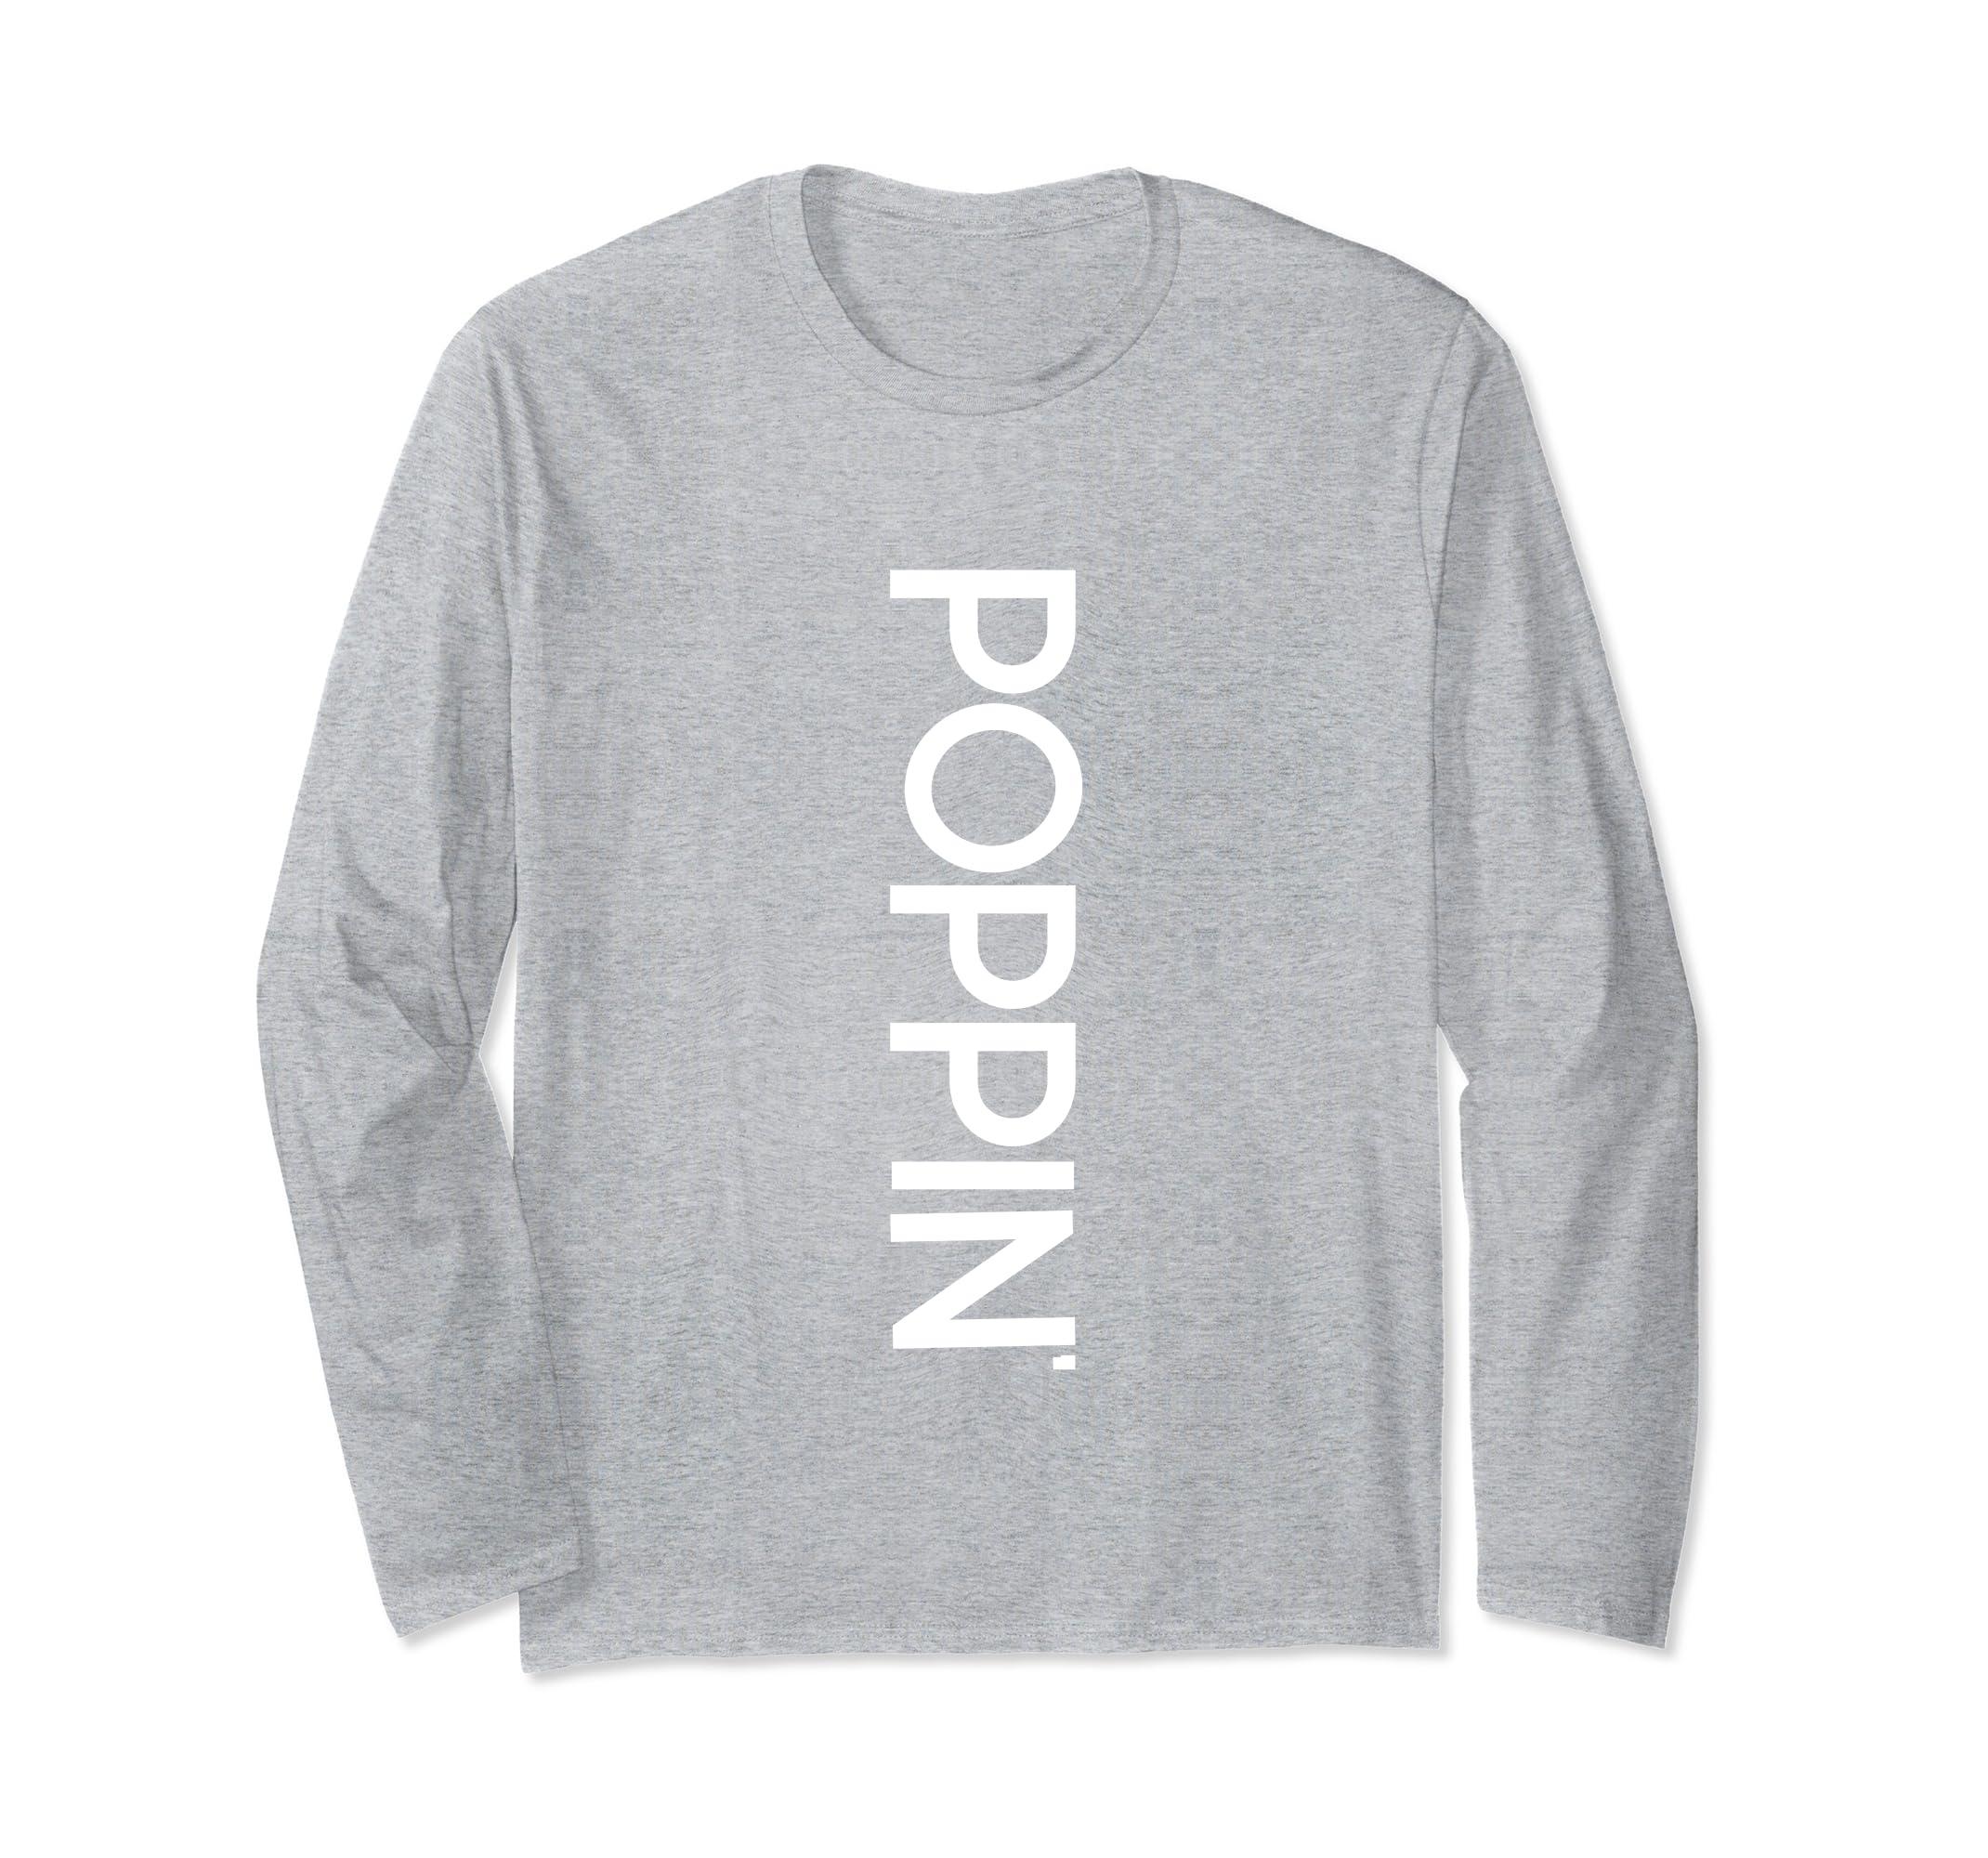 Long Sleeve Melanin Poppin Cute Simple Tshirt-Bawle